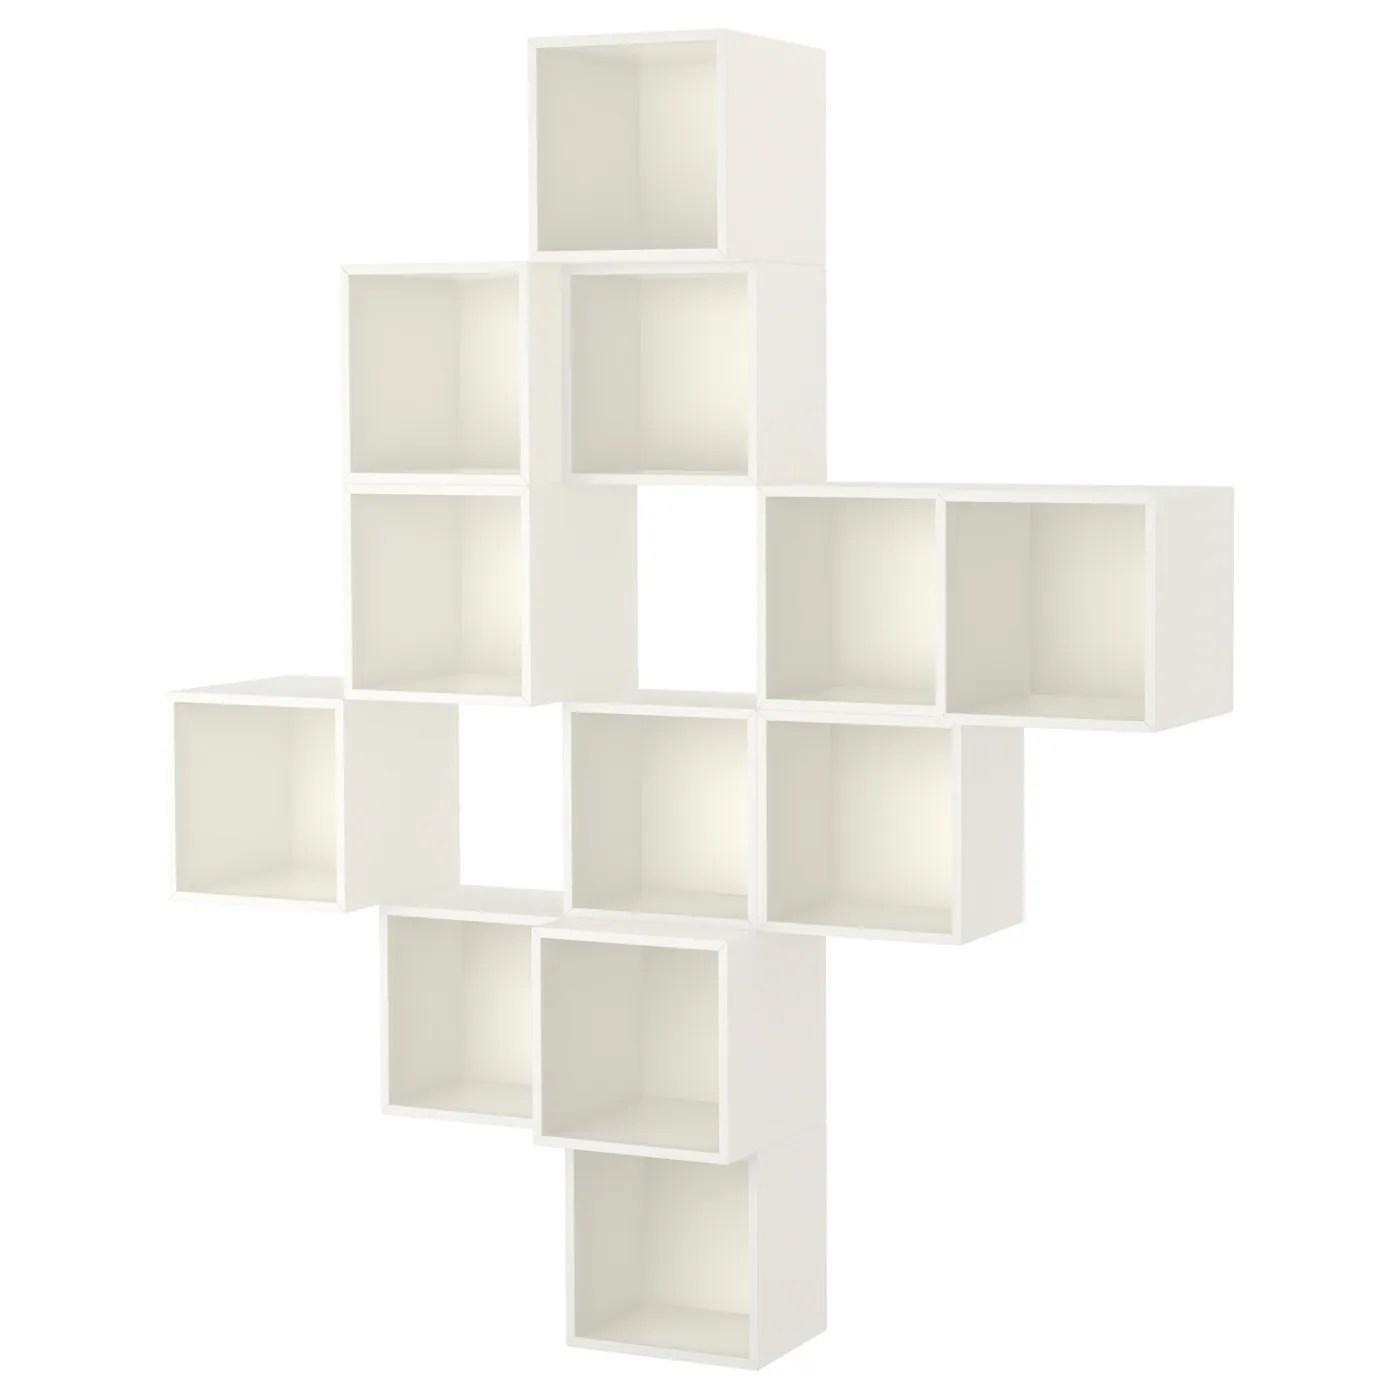 Wall Mounted Cabinet Combination Eket White